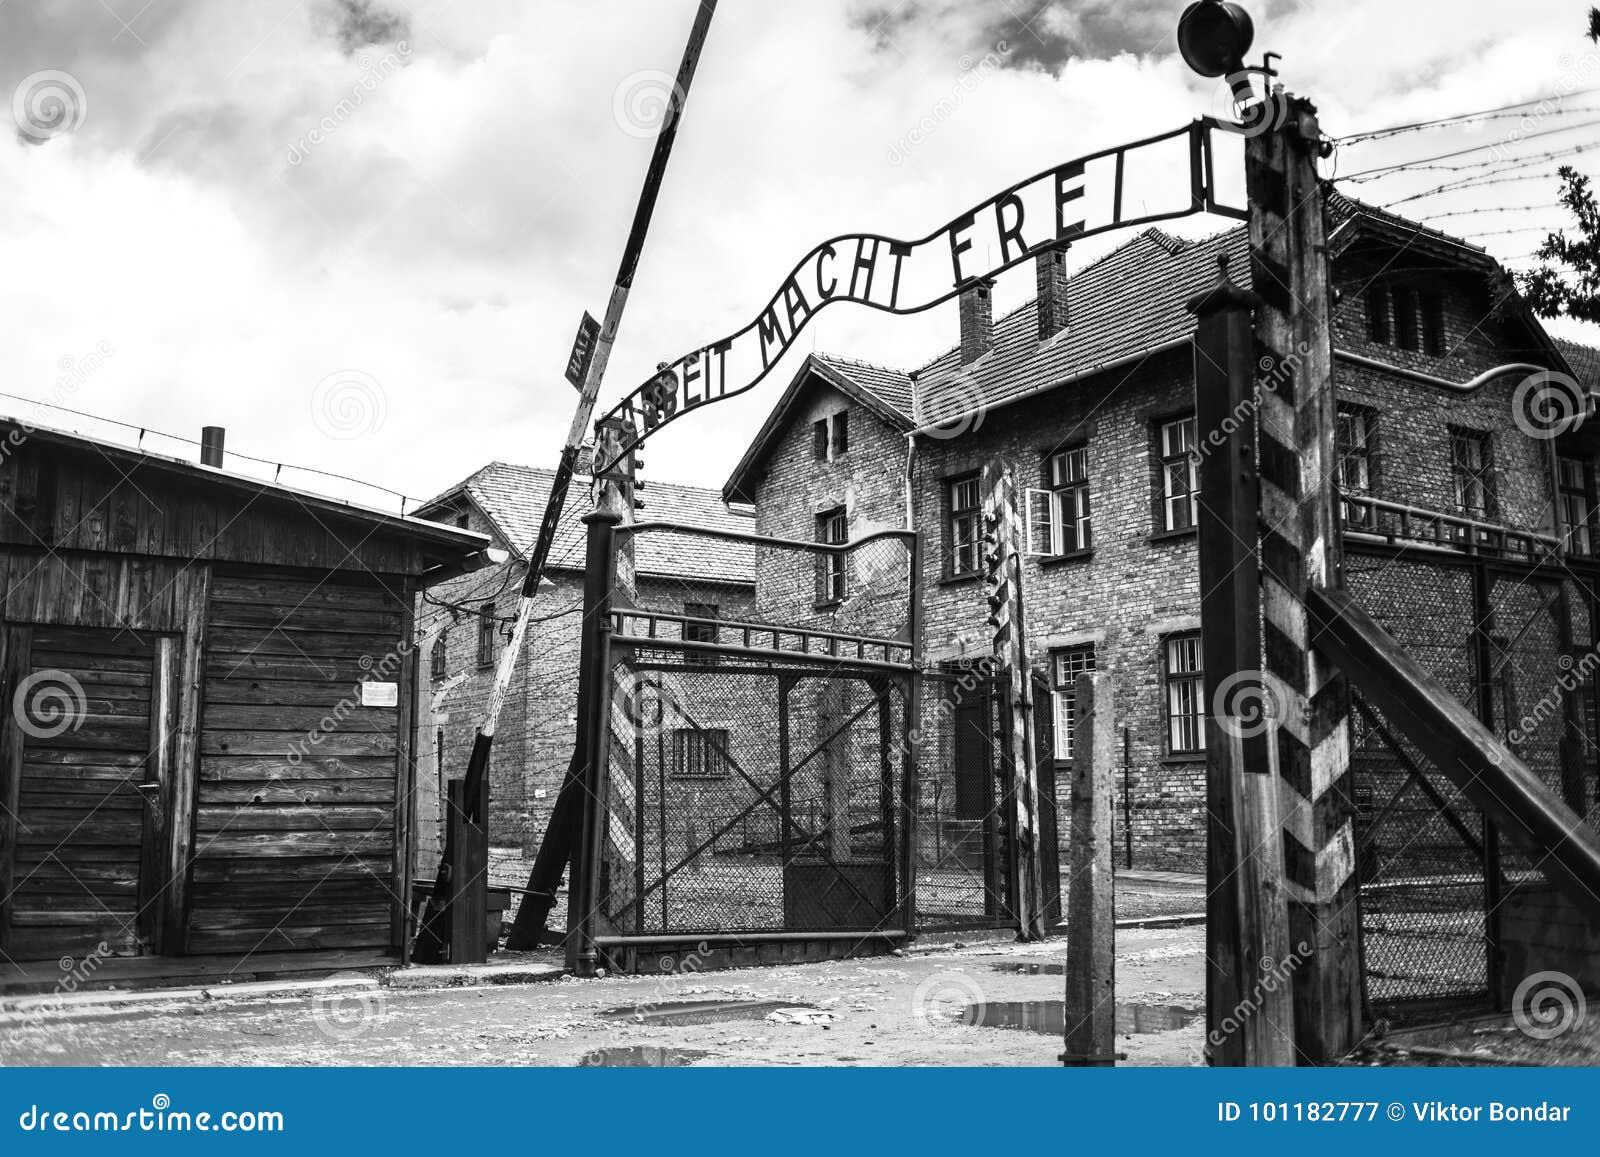 Adolf Hitler: A Study in Tyranny